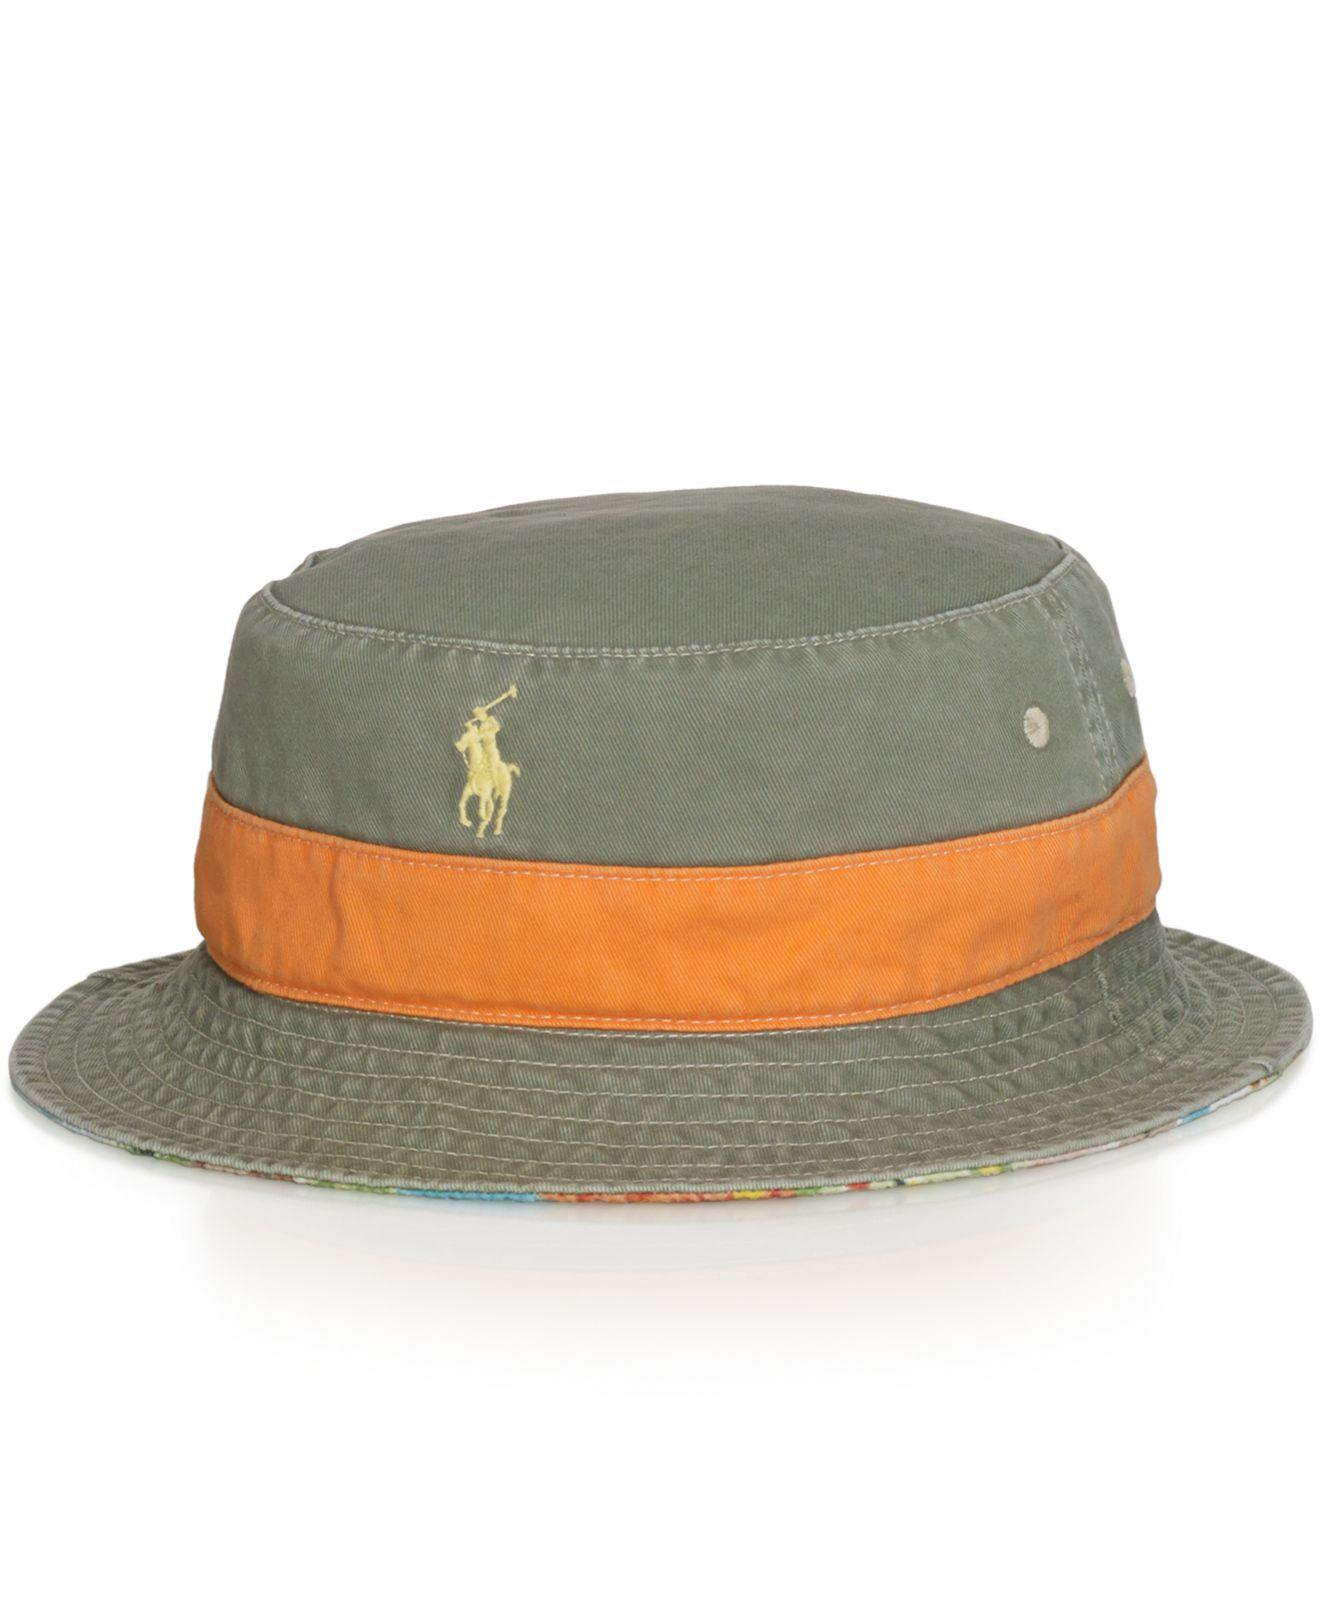 d0549d9e8be Lyst - Polo Ralph Lauren Reversible Bucket Hat for Men